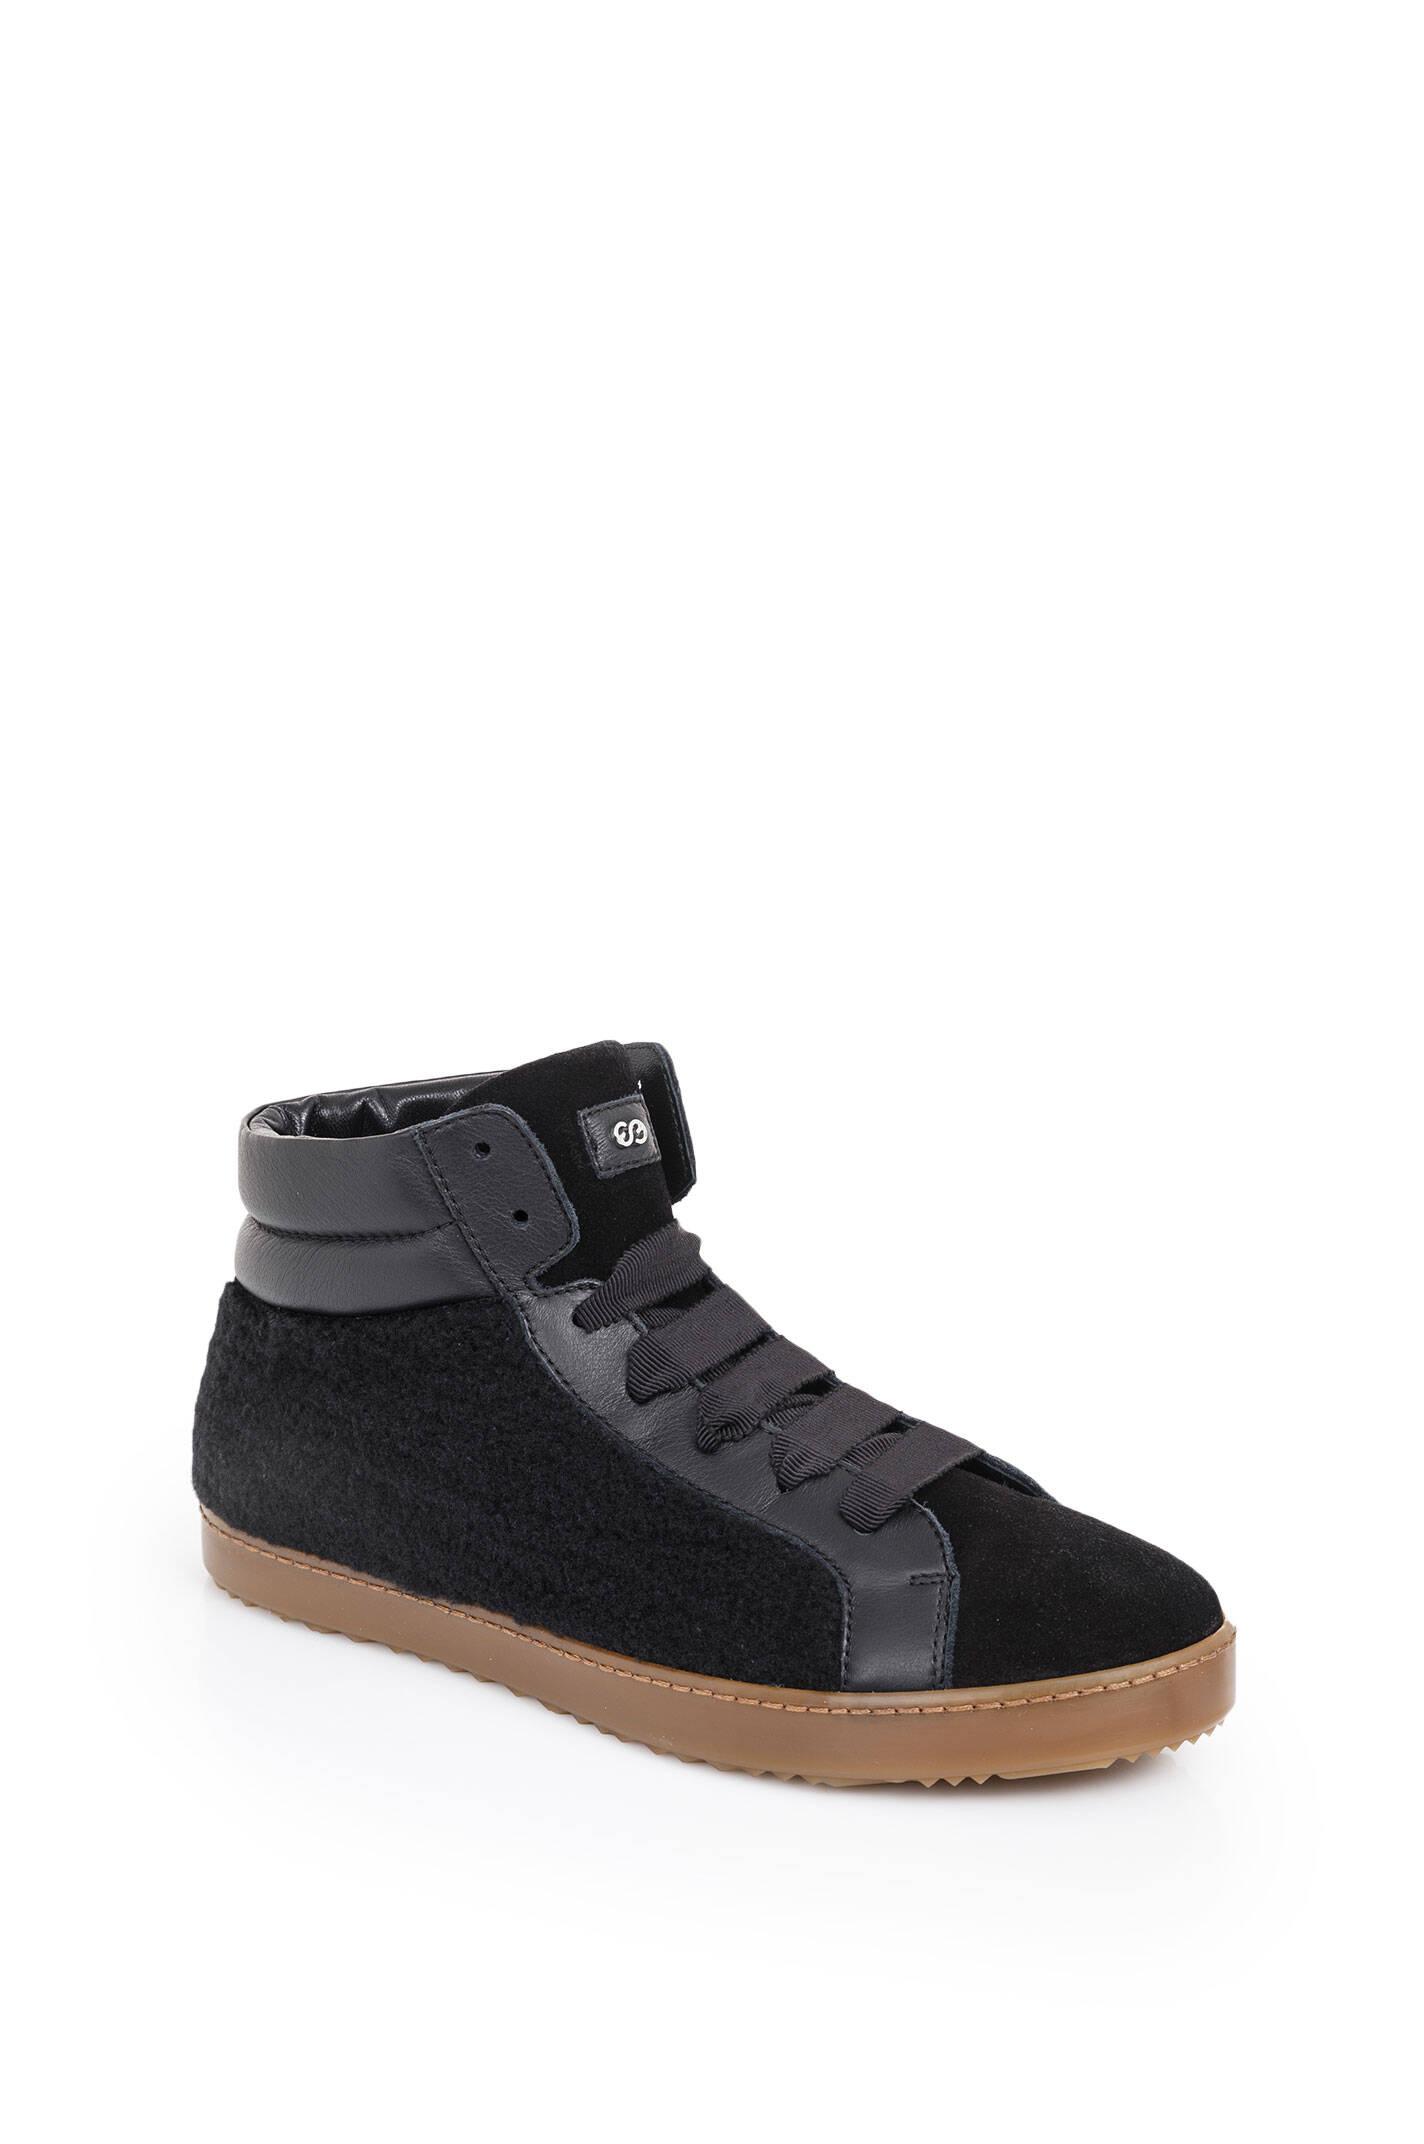 sneakers escada sport black sneakers gomez pl